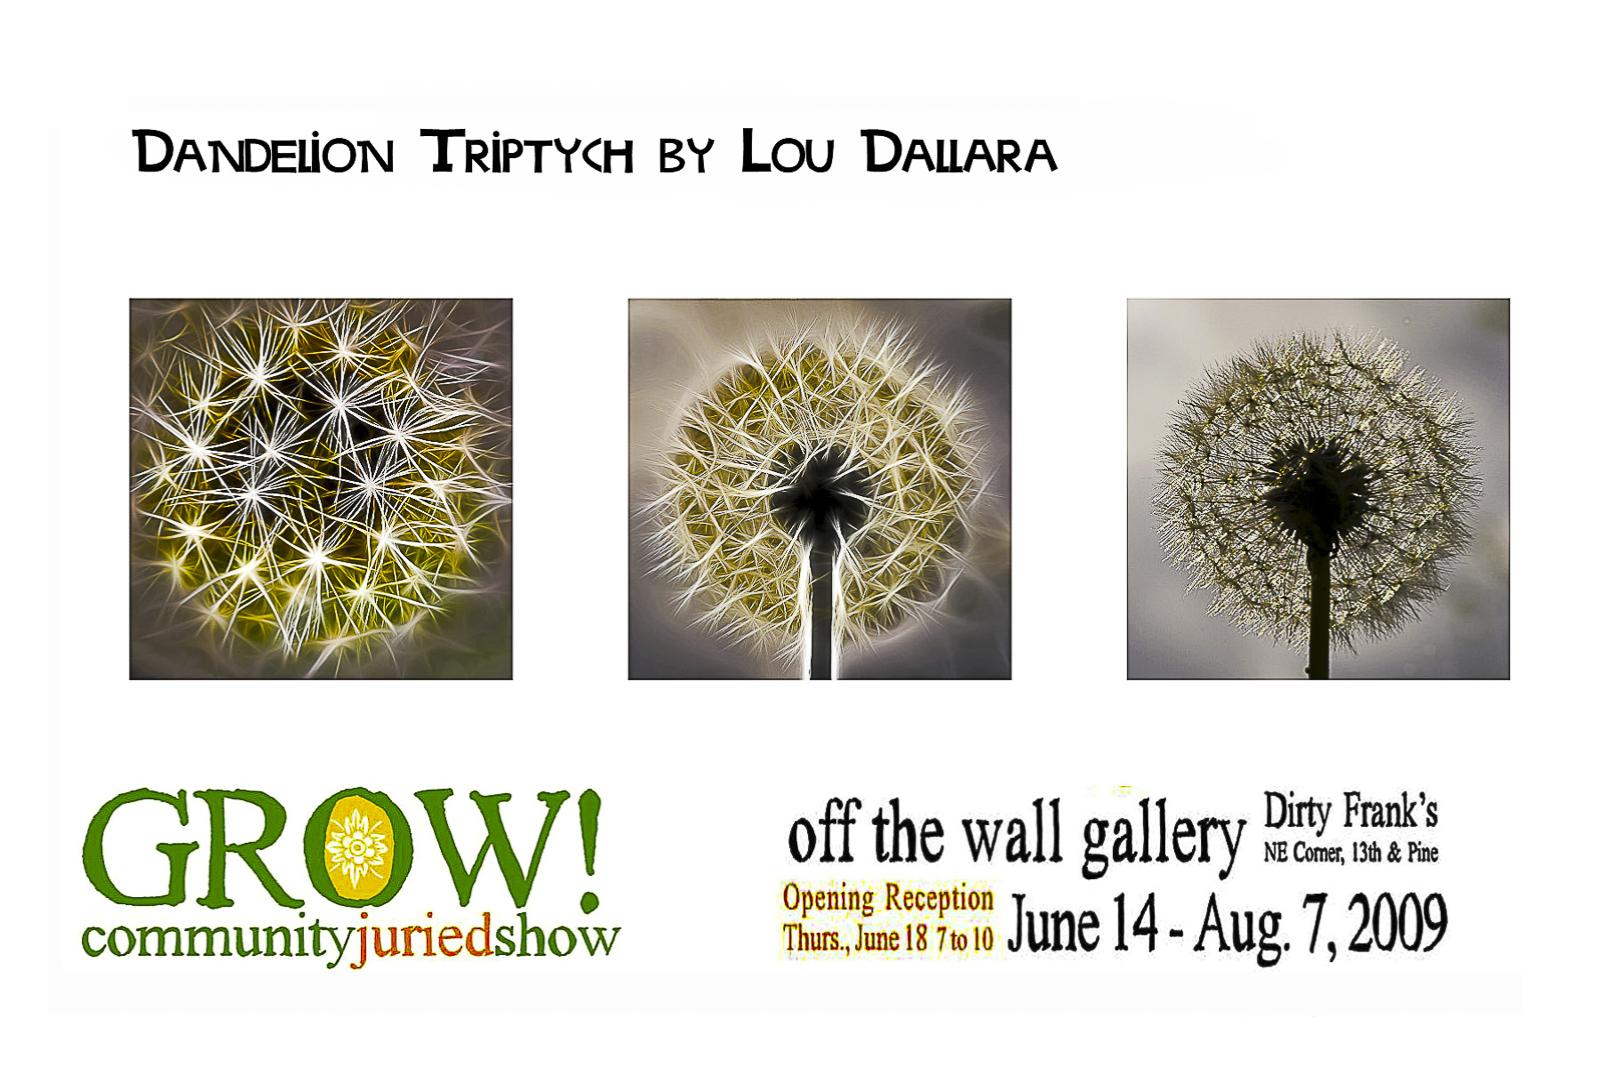 dandelion-triptych